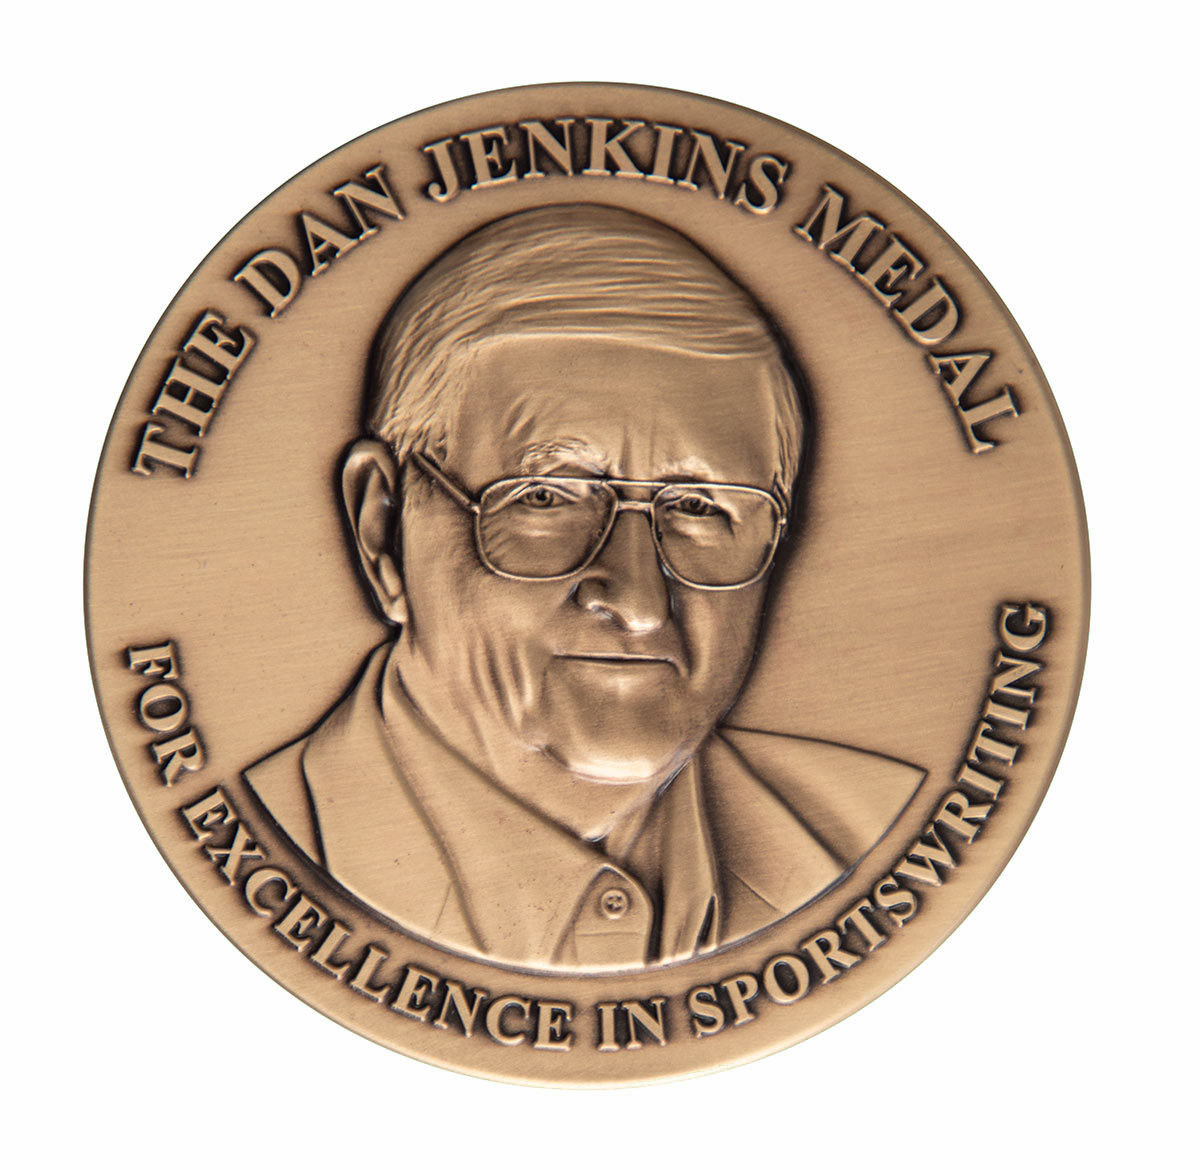 Jenkins Medal